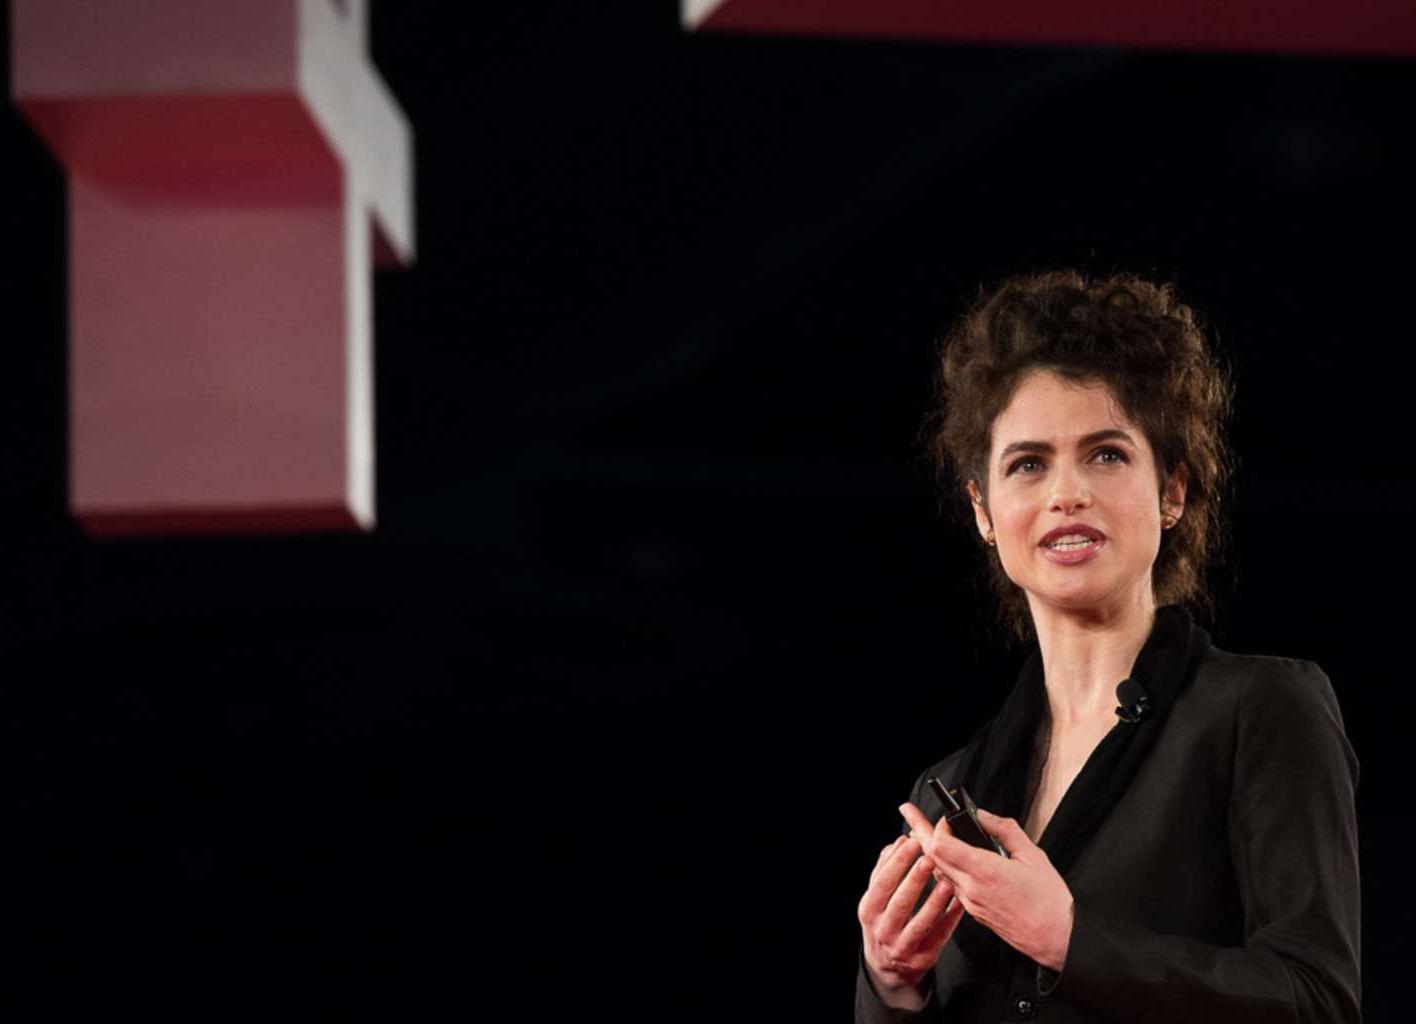 Neri Oxman, Keynote Speaker,photo credits: AIA